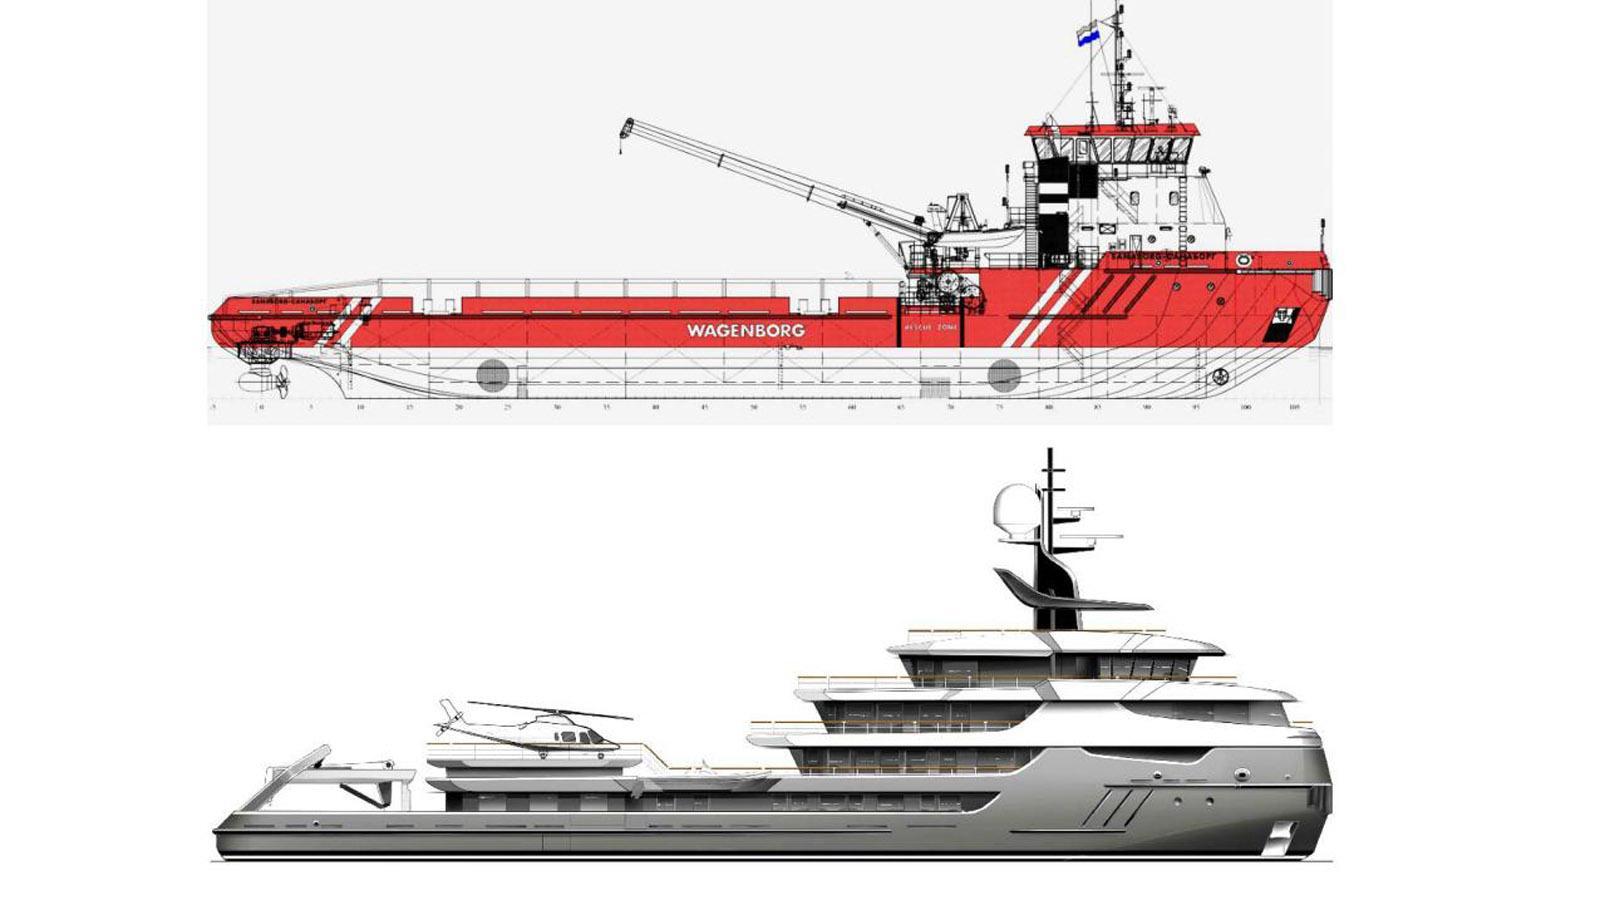 ragnar sanaborg motoryacht niestern sander icon 68m 2019 rendering conversion